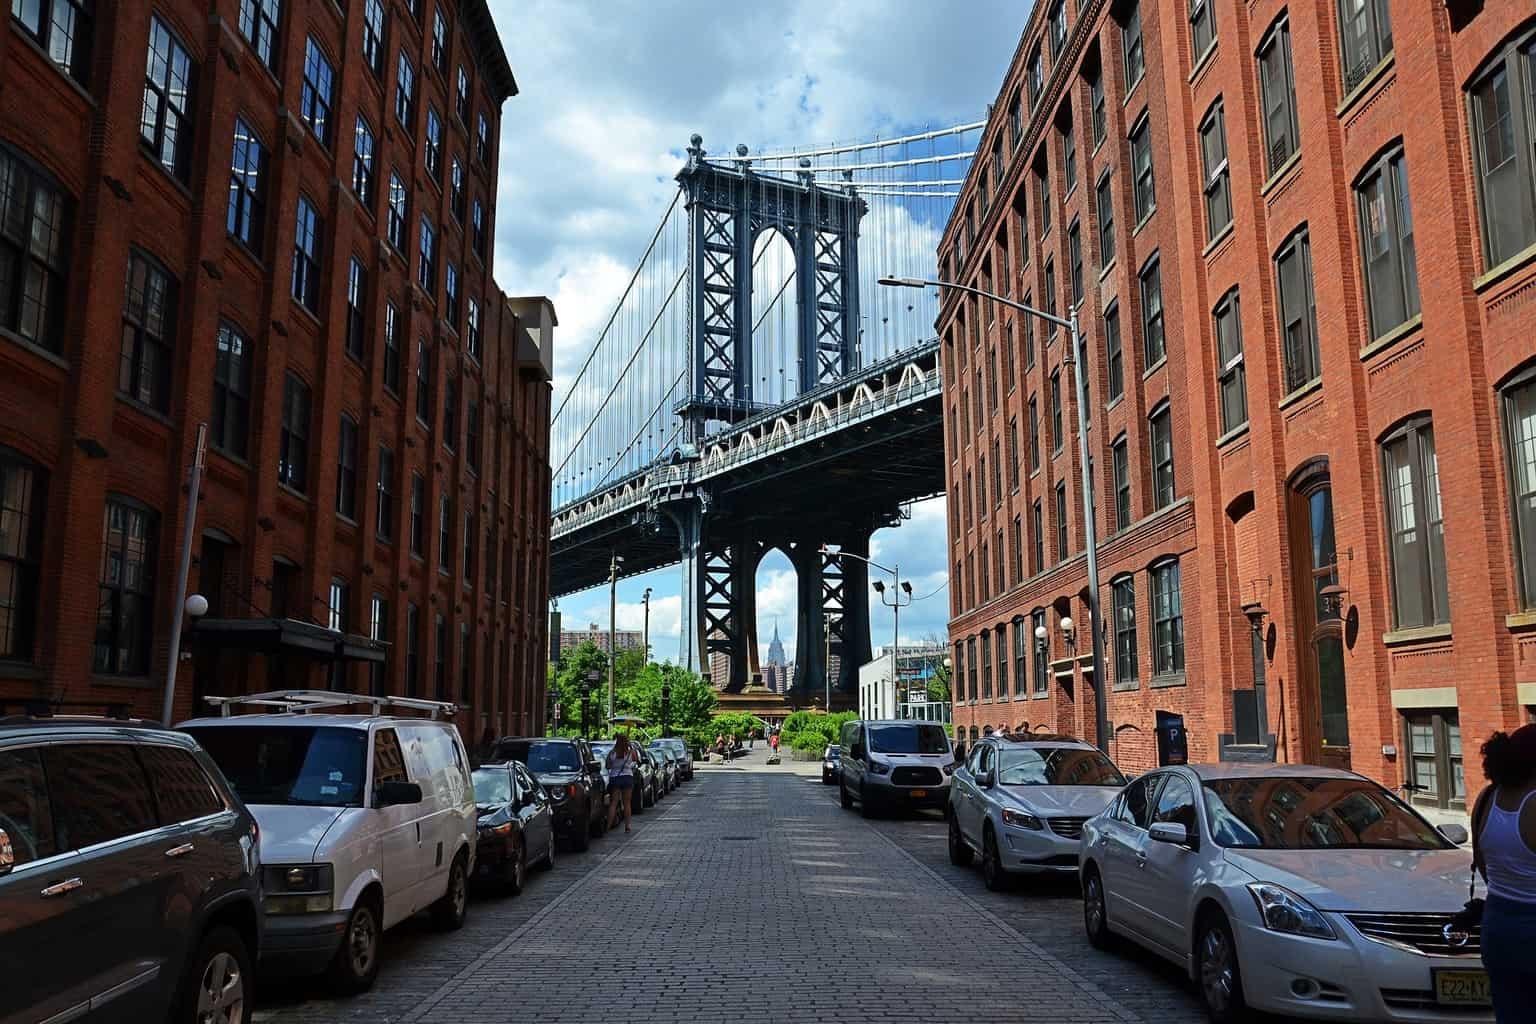 The Manhattan Bridge in DUMBO